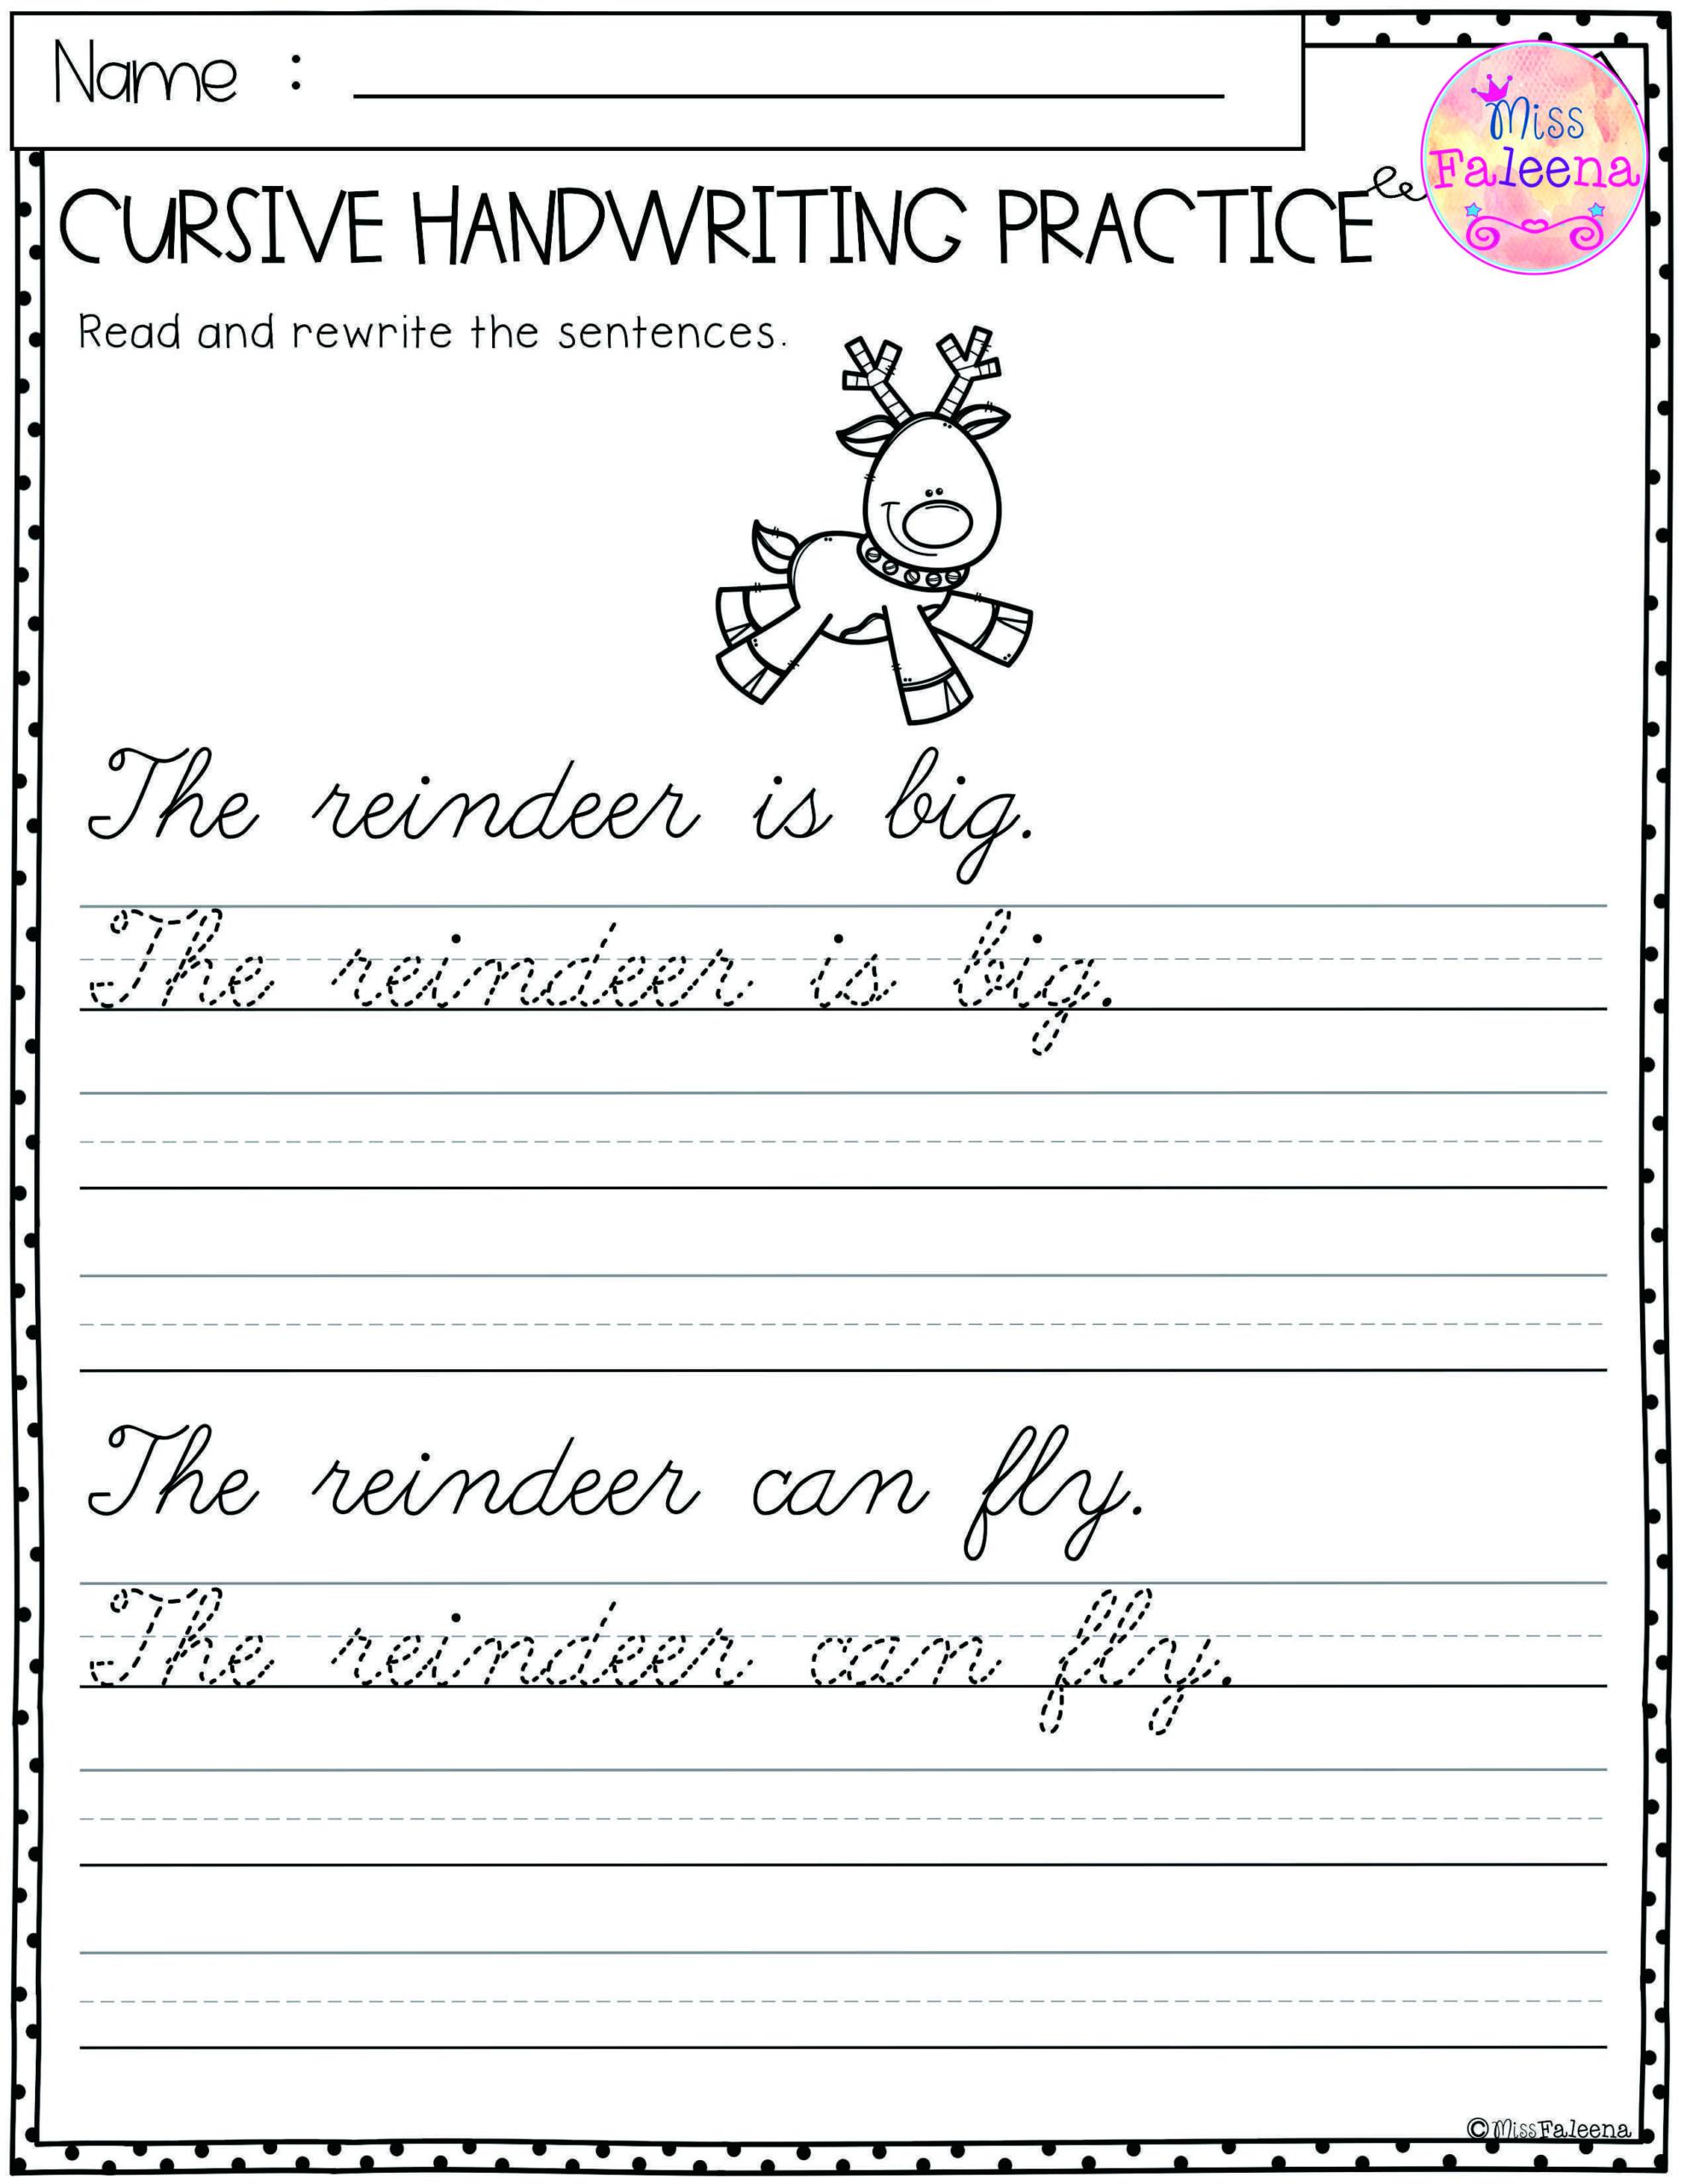 Christmas Cursive Handwriting Practice | Cursive Handwriting